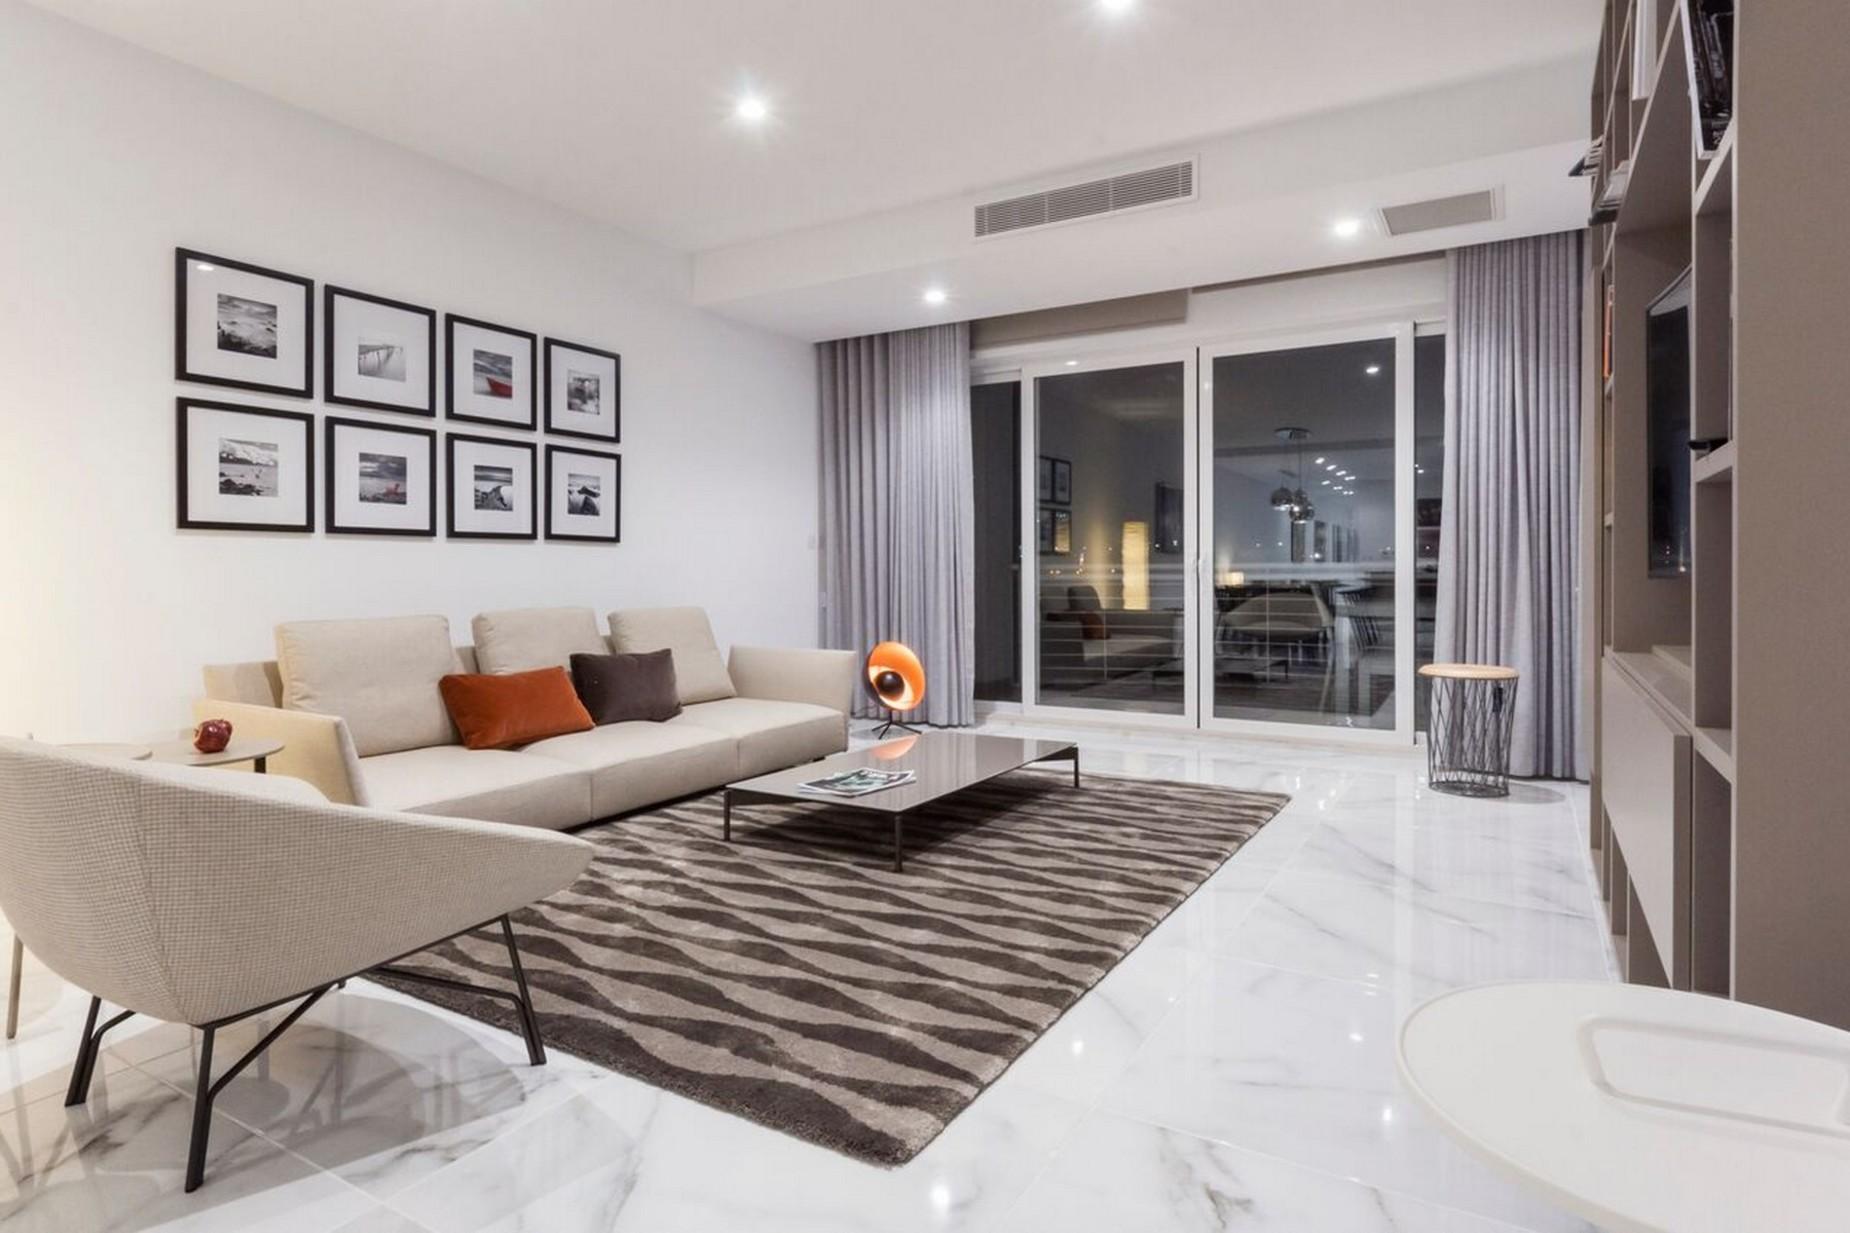 0 bed Apartment For Rent in Sliema, Sliema - thumb 3